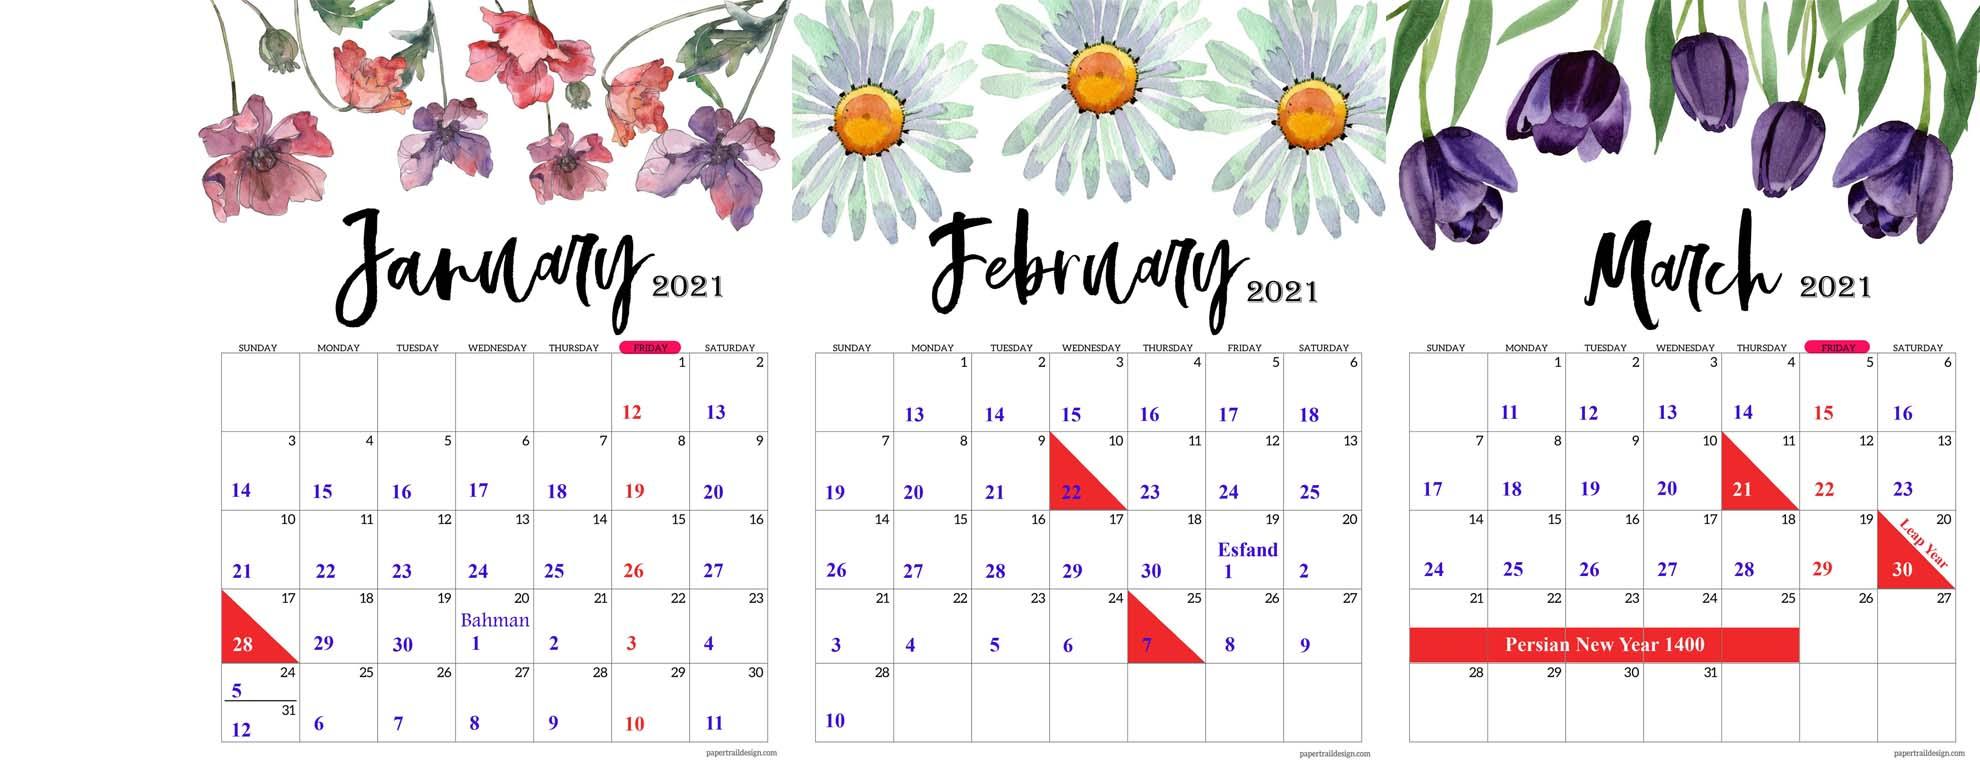 Persian Calendar, A Solar Hijri Calendar  Julian Dates And Intended For Julian Vs Gregorian Calendar 2021